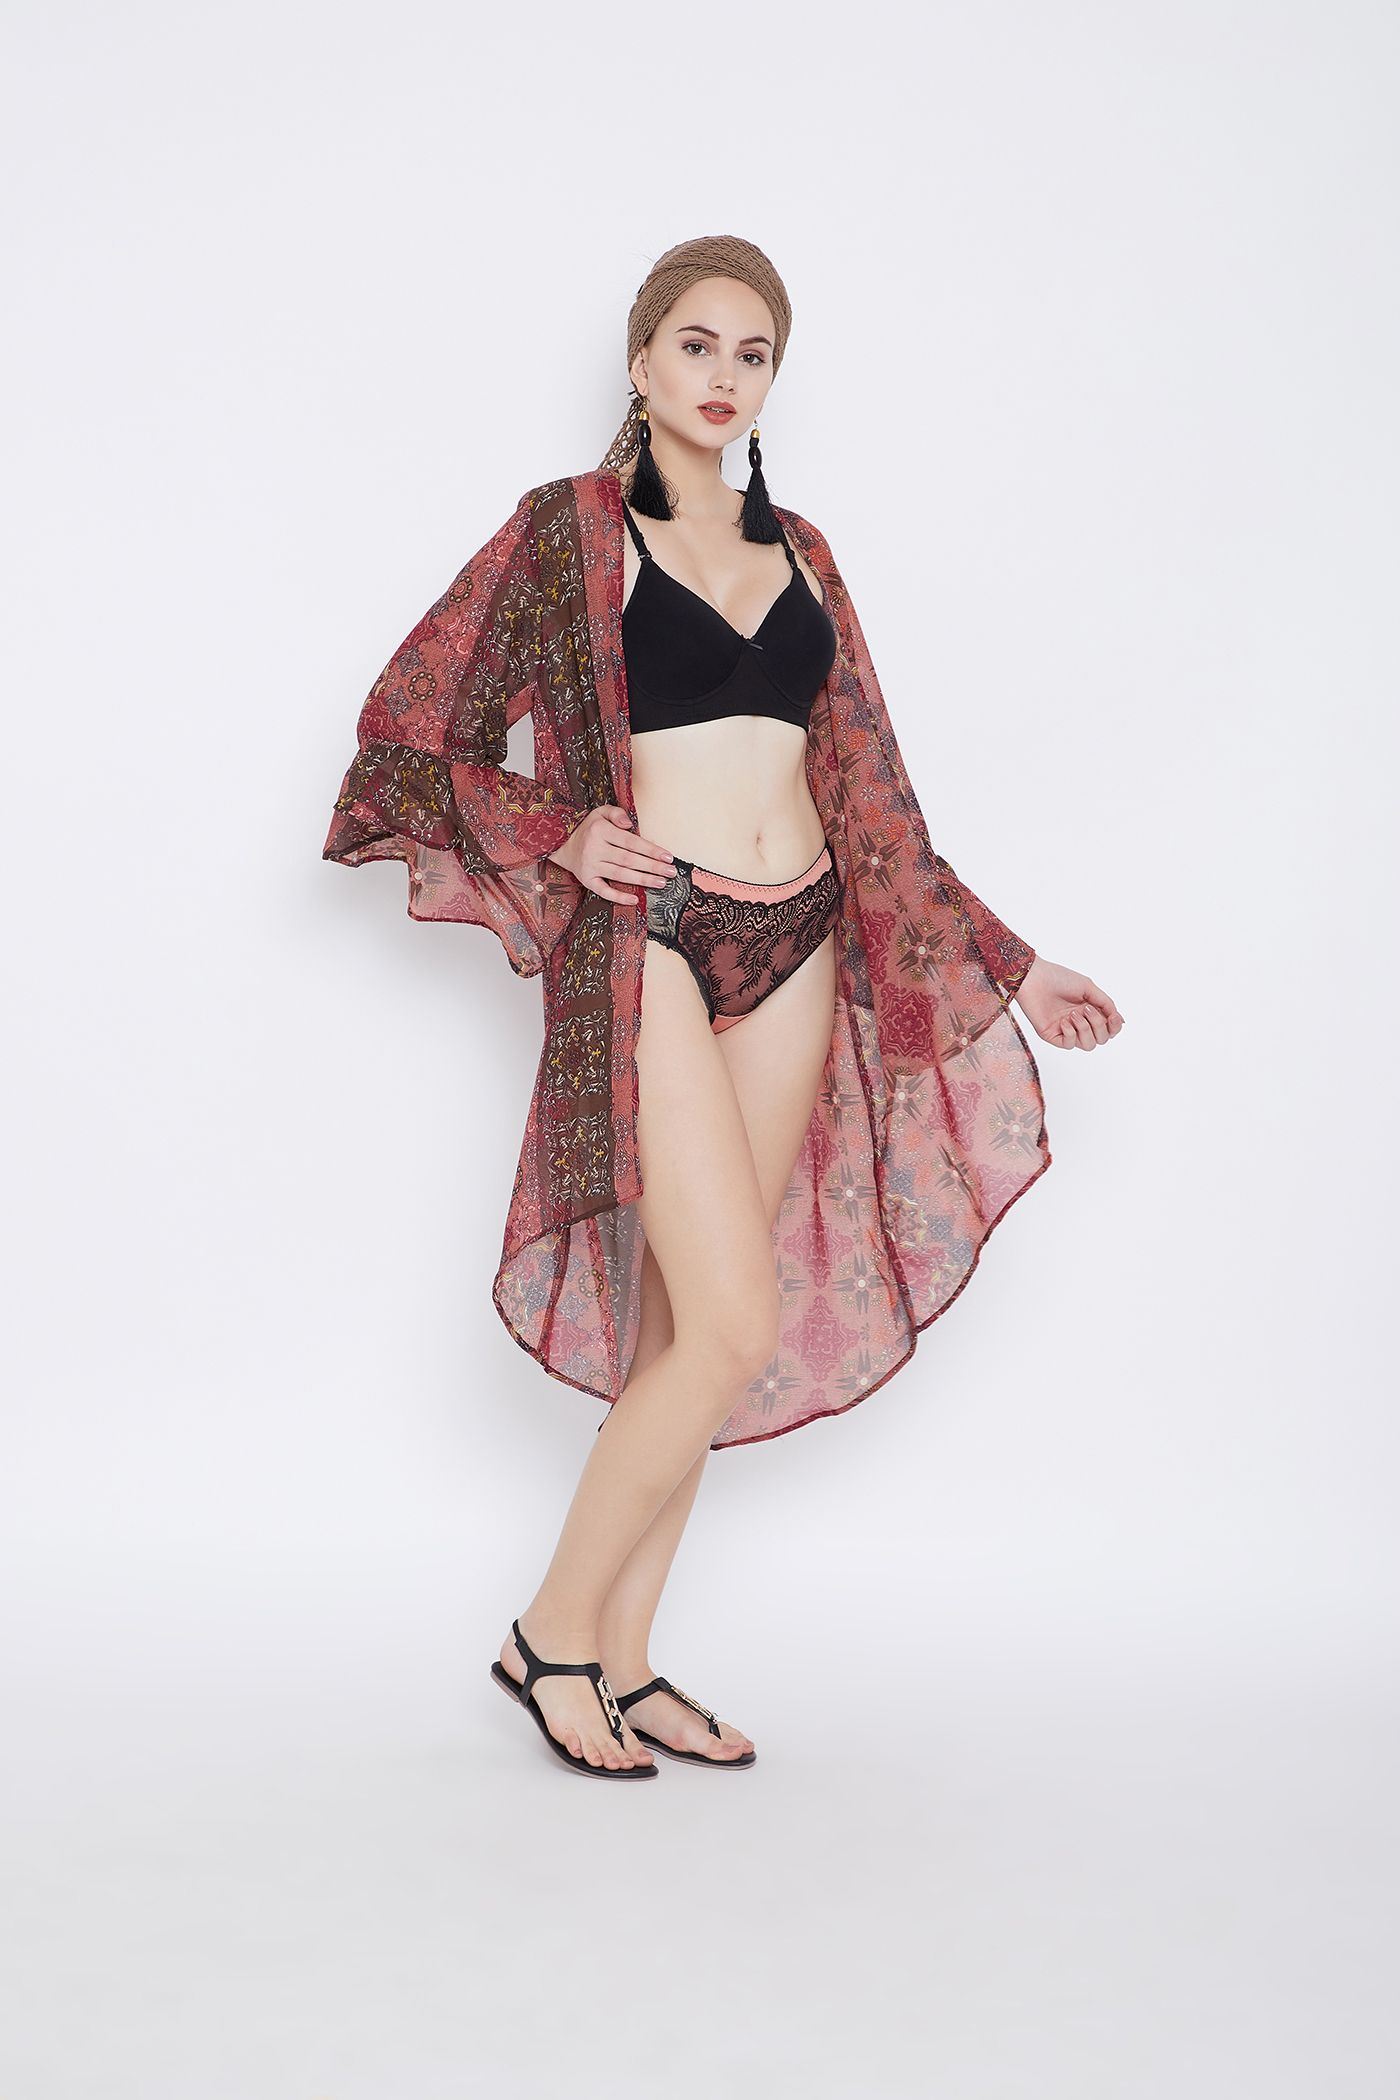 39344611e5aeb Canyon Rose Beach Cover Ups for Women Beach Swimsuit Digital Printed Bikini  Cover Up Kimono Sleeve Summer Beach Dresses for Women Plus Size Bathing Suit  ...